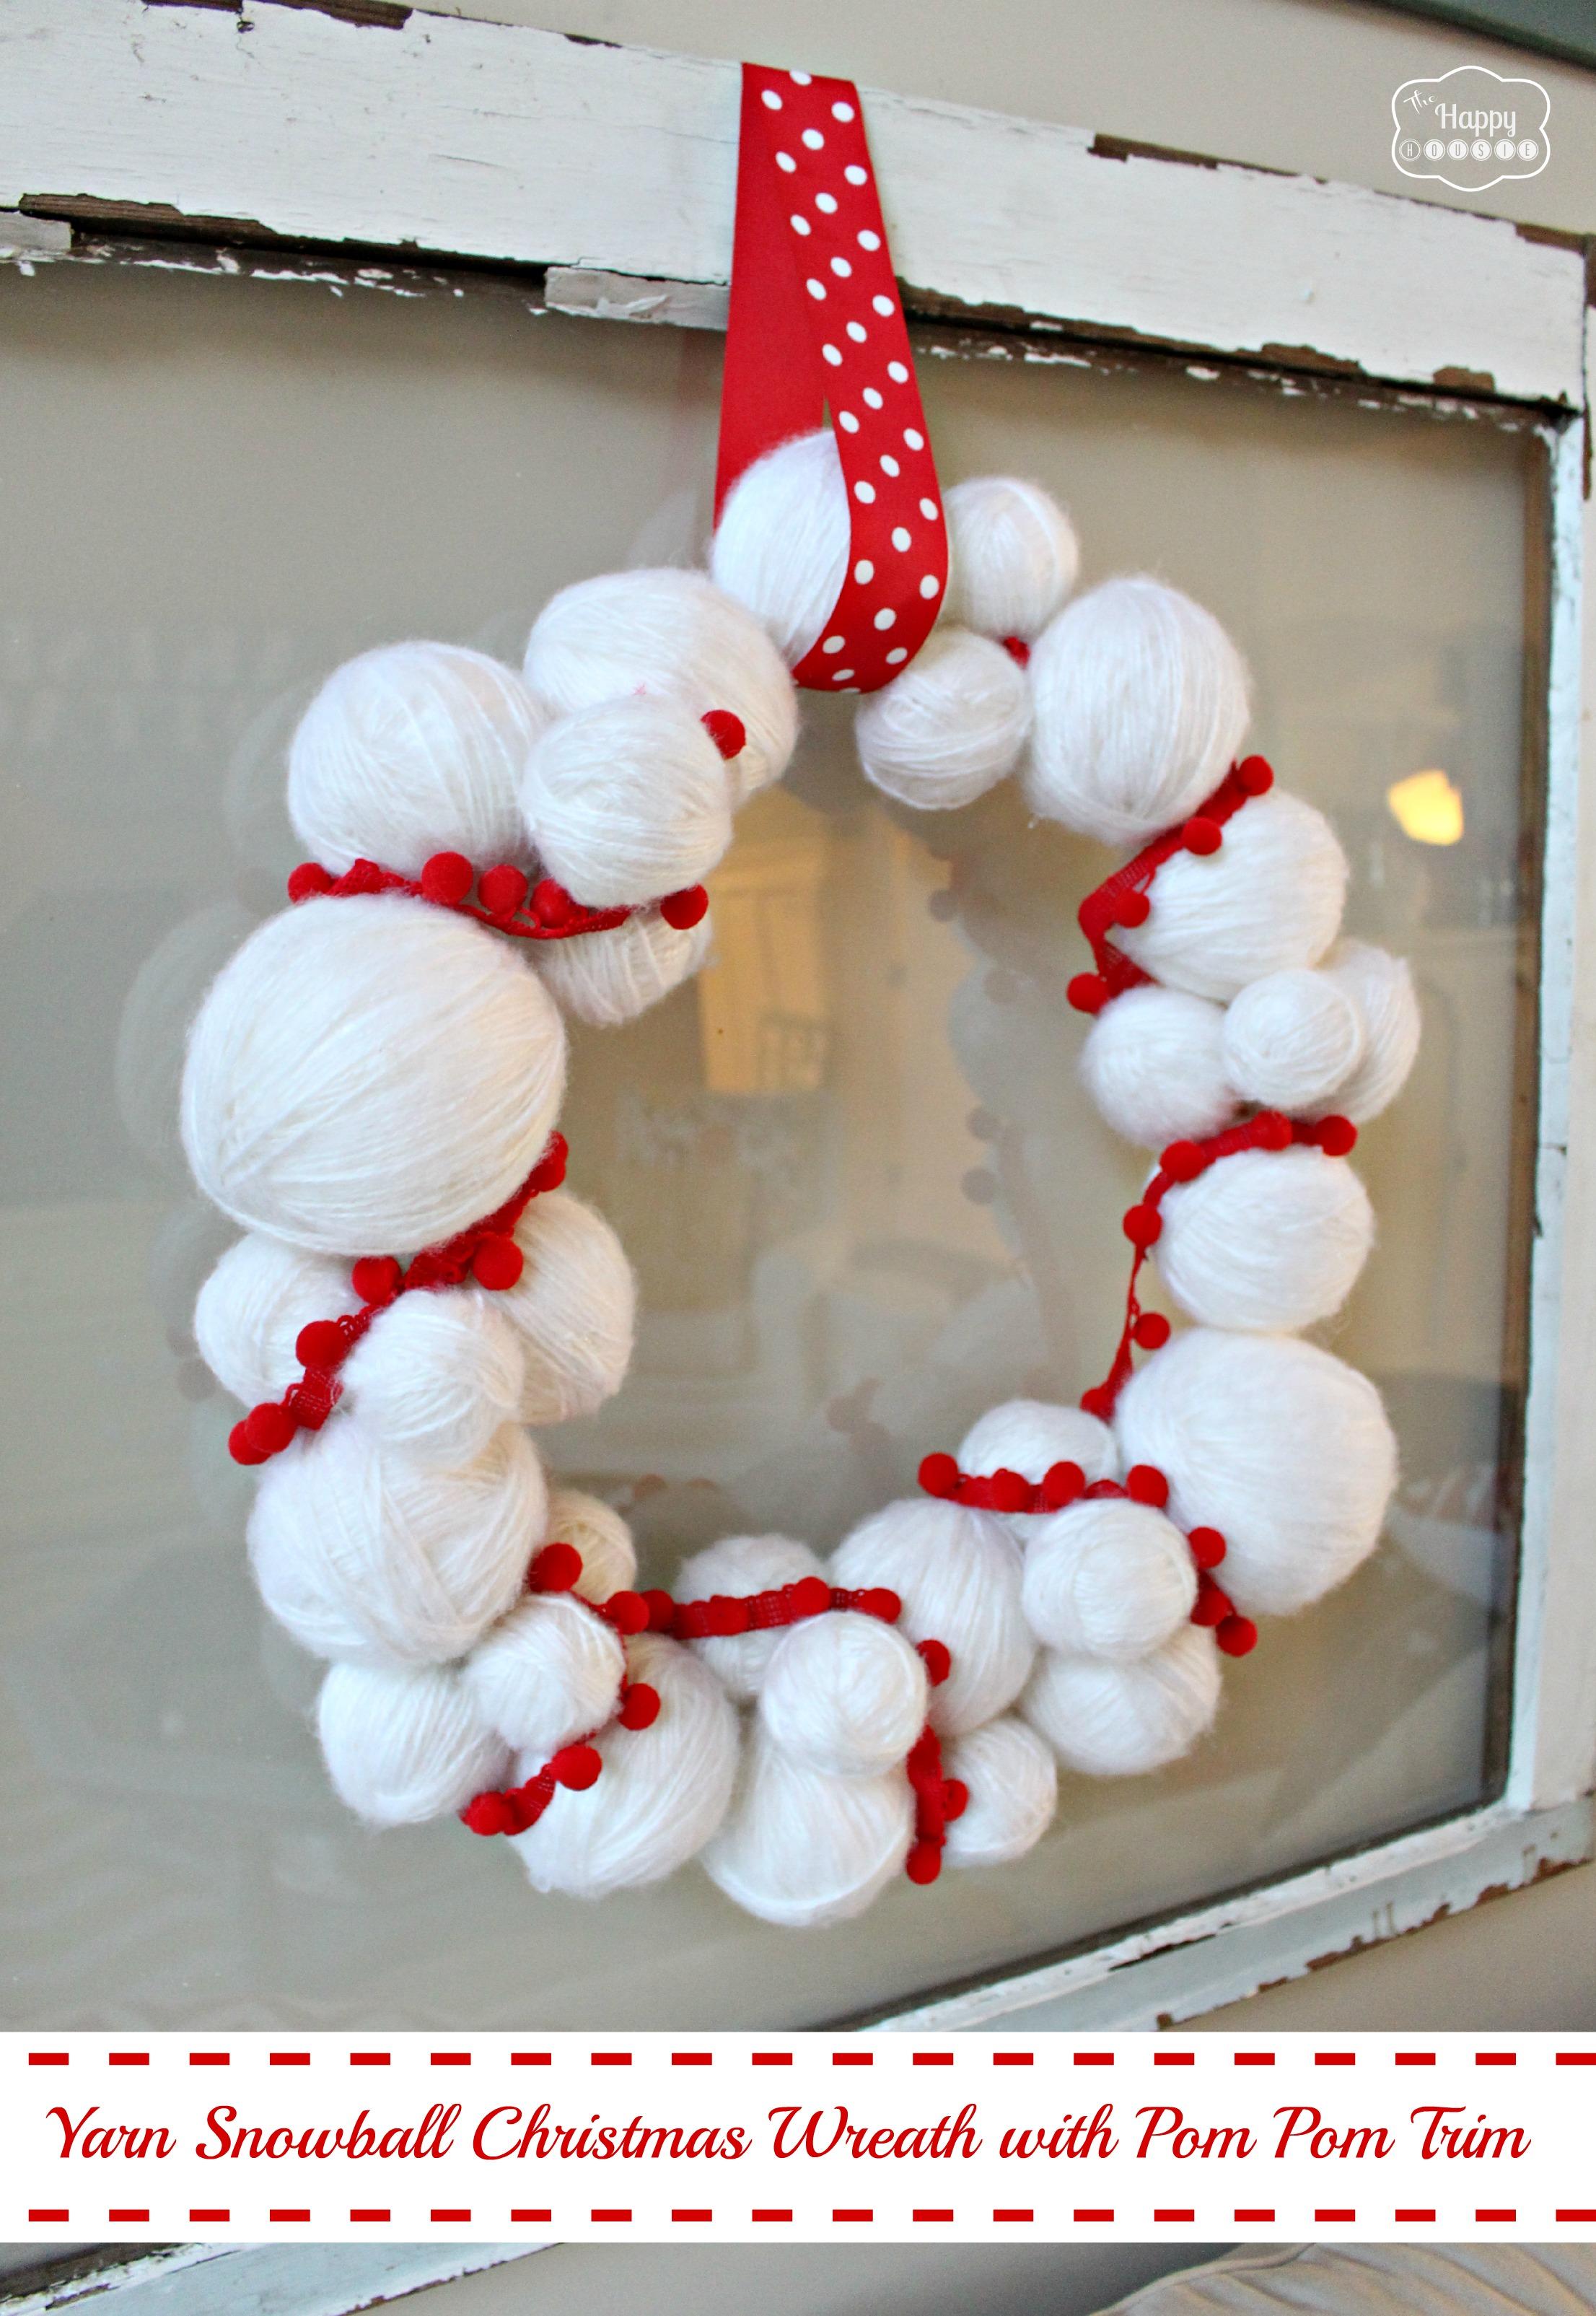 yarn snowball christmas wreath and nine other awesome wreath ideas